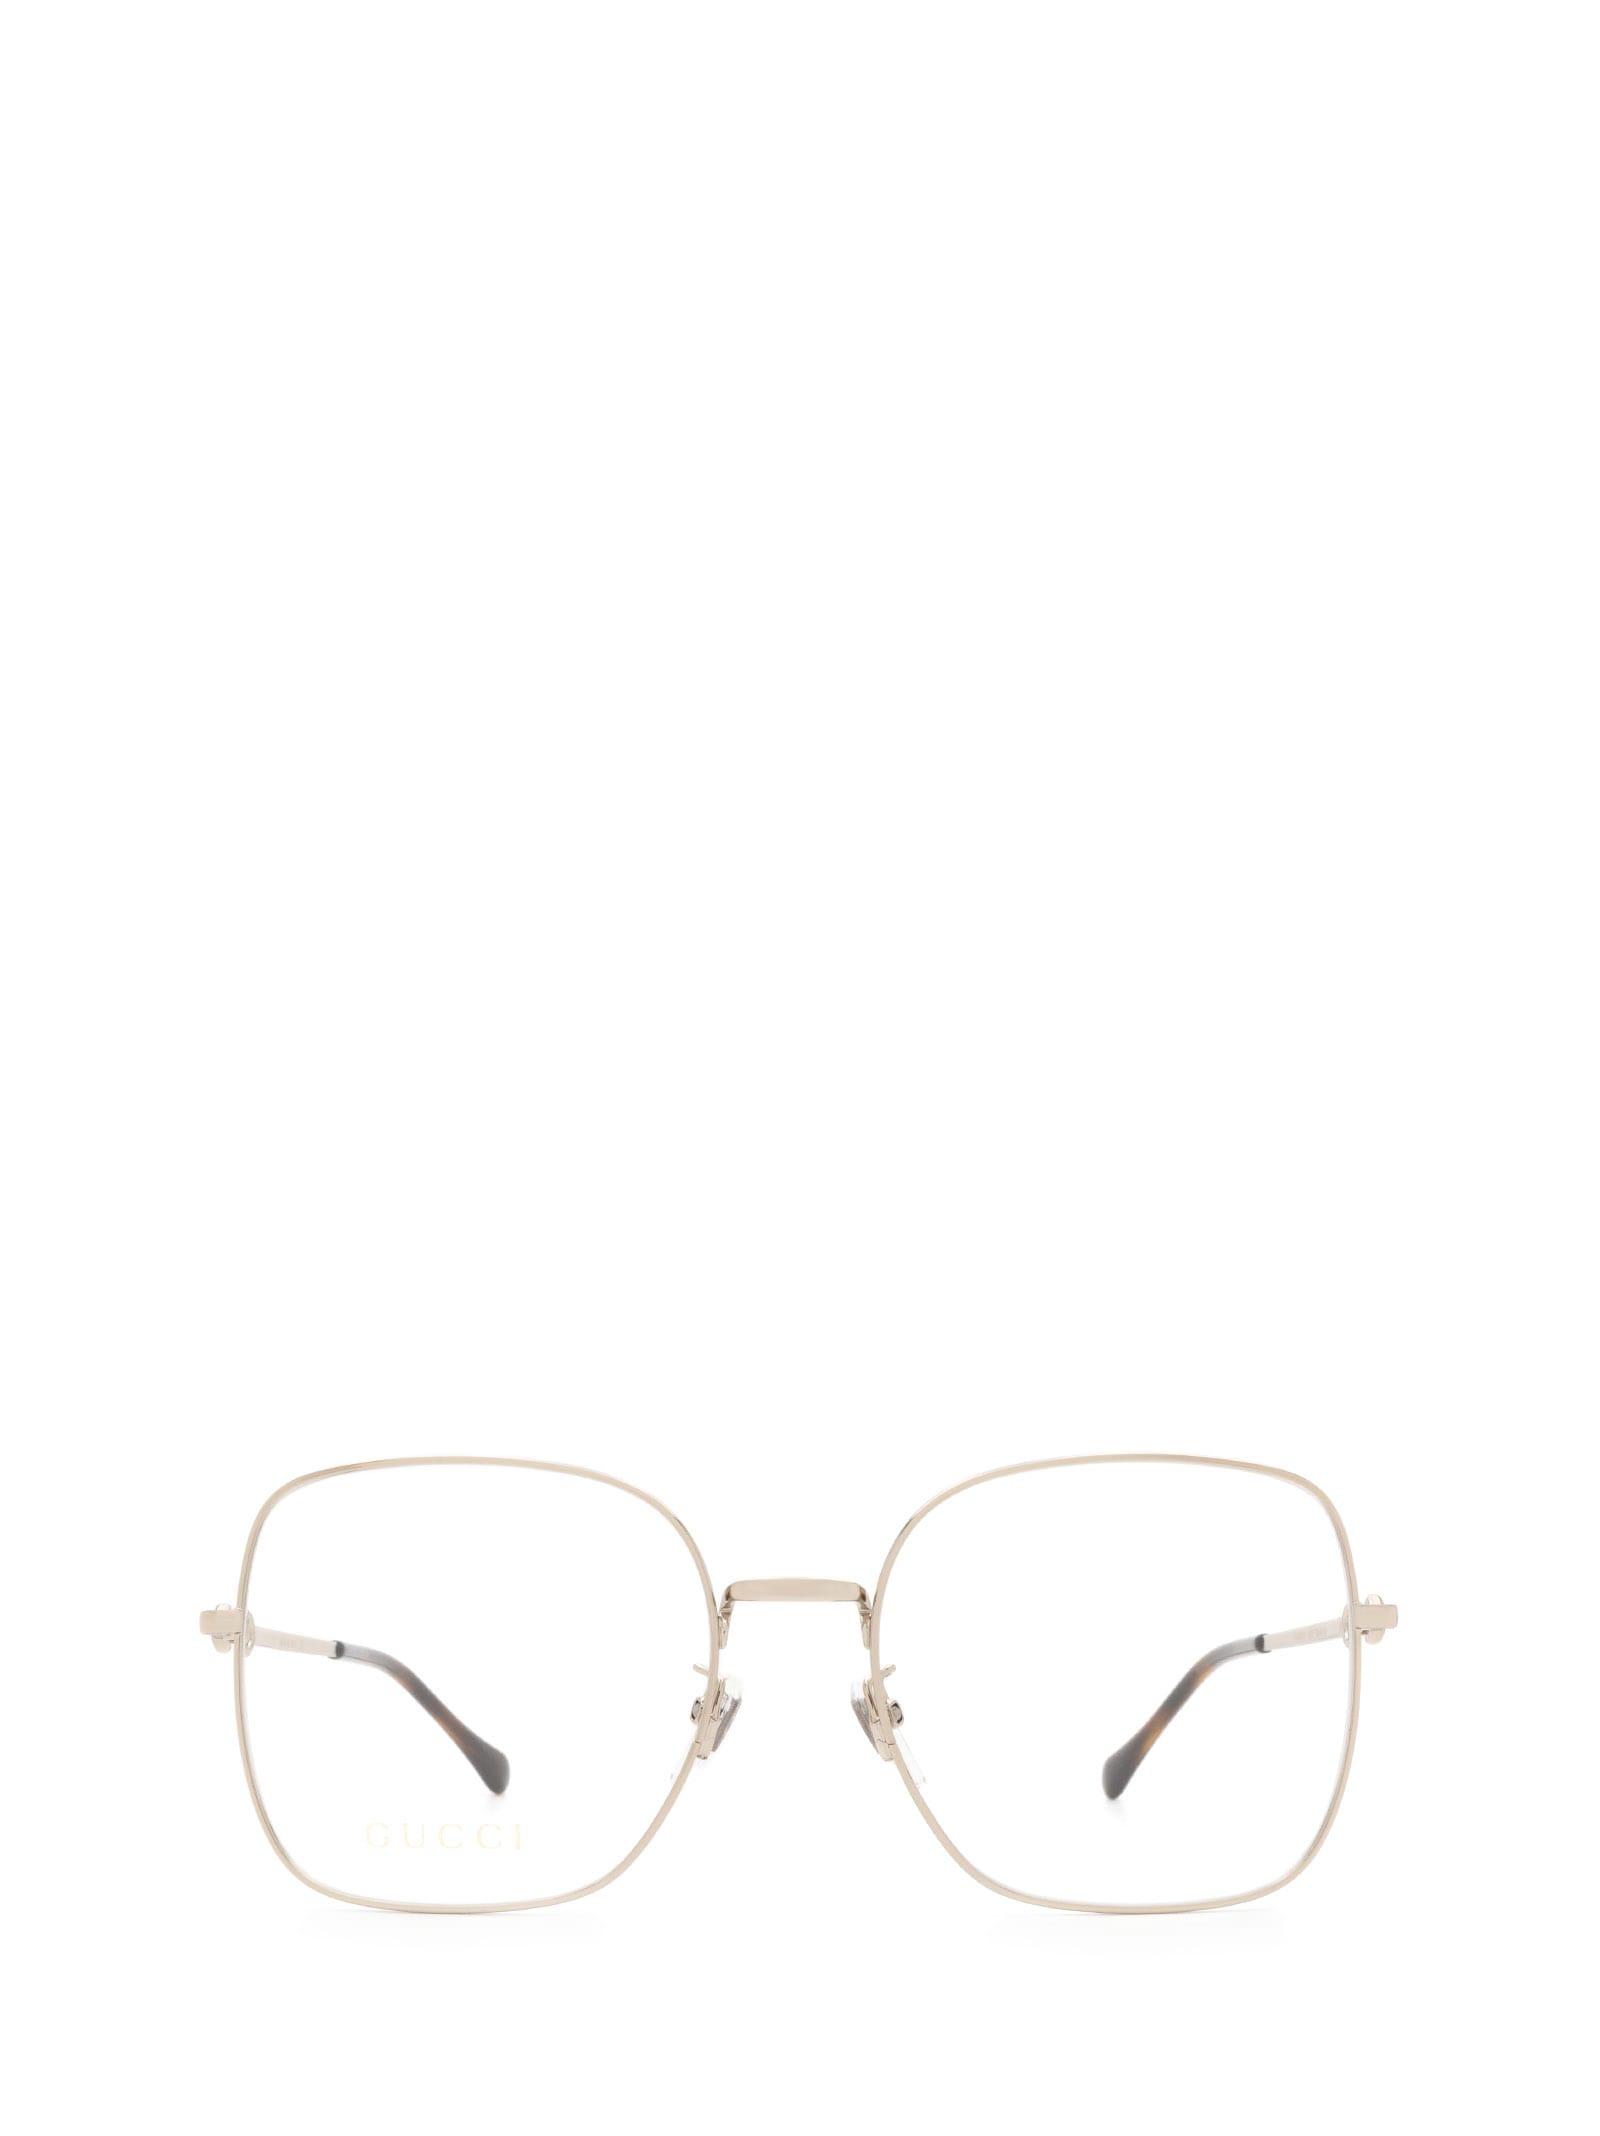 Gucci Opticals GG0883OA GOLD GLASSES